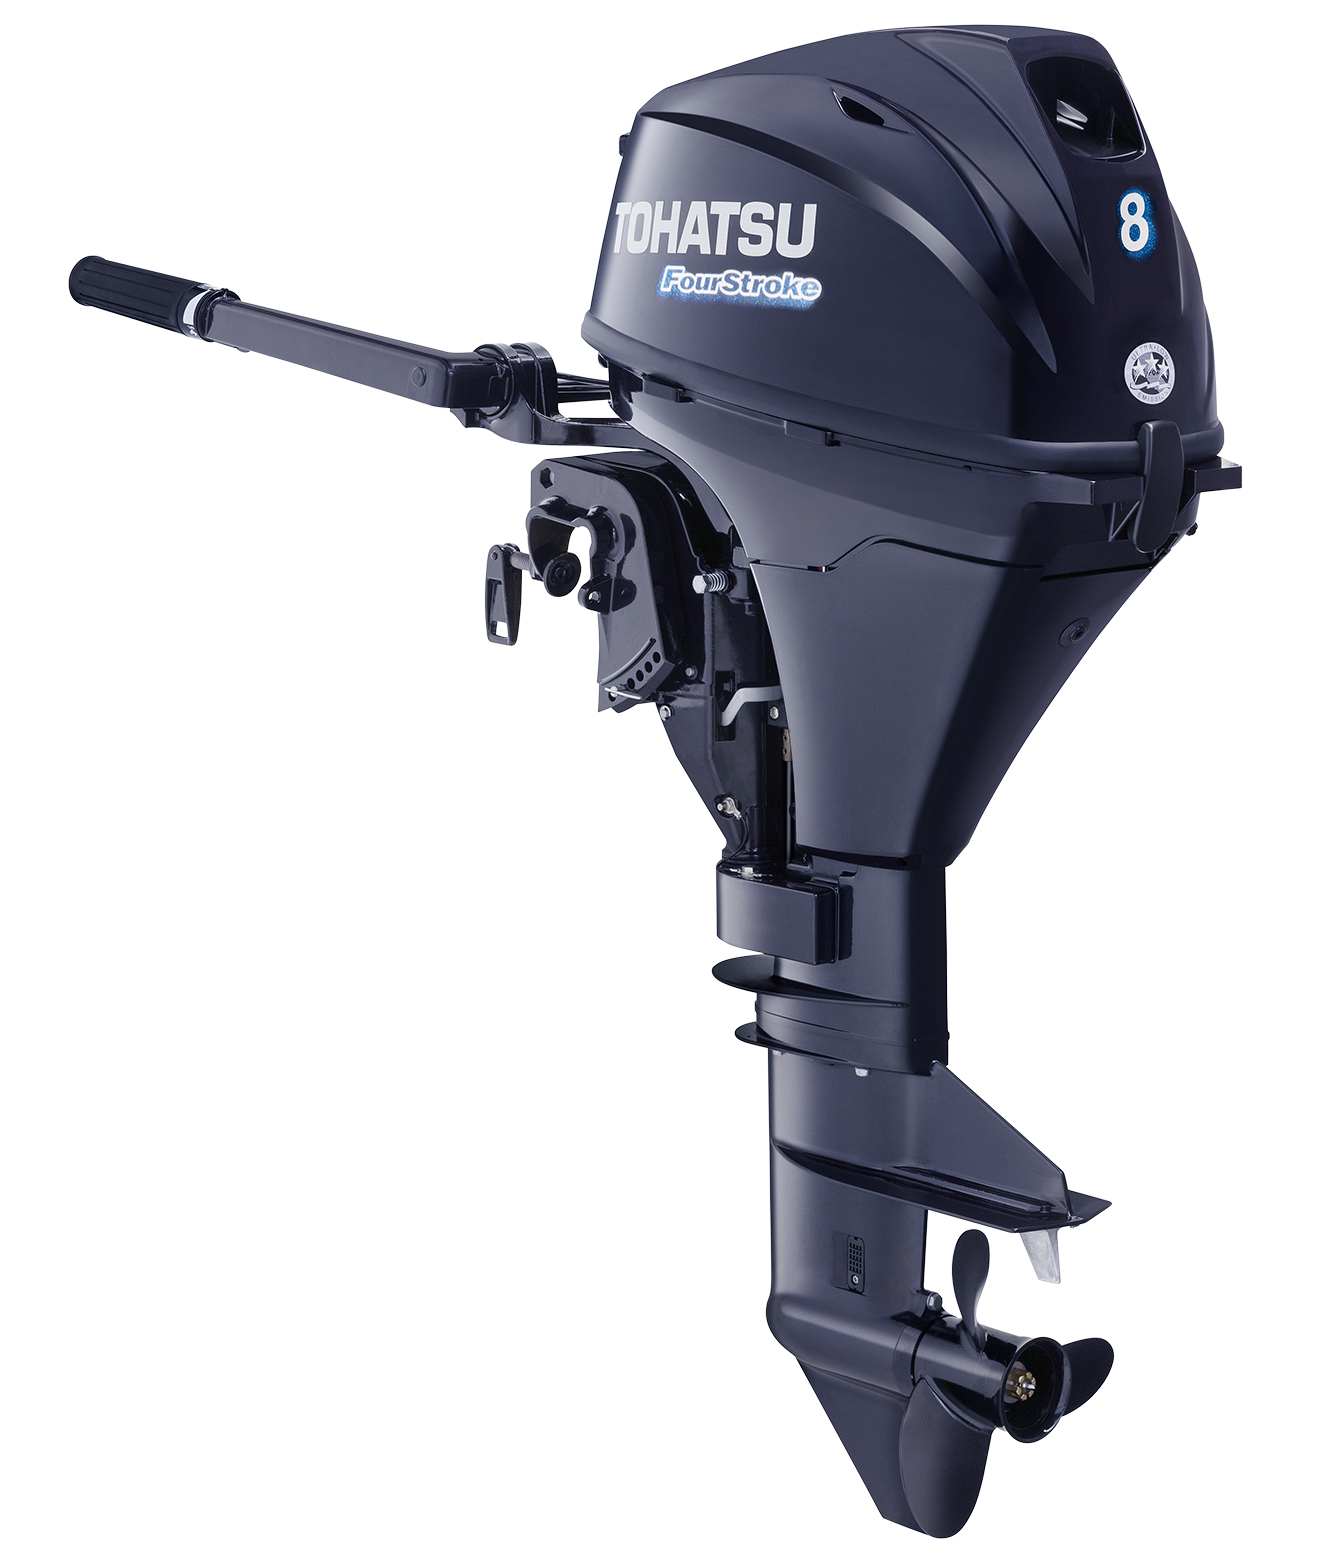 2017 Tohatsu 8 Hp 4 Stroke Outboard Motor Tiller 15 Shaft